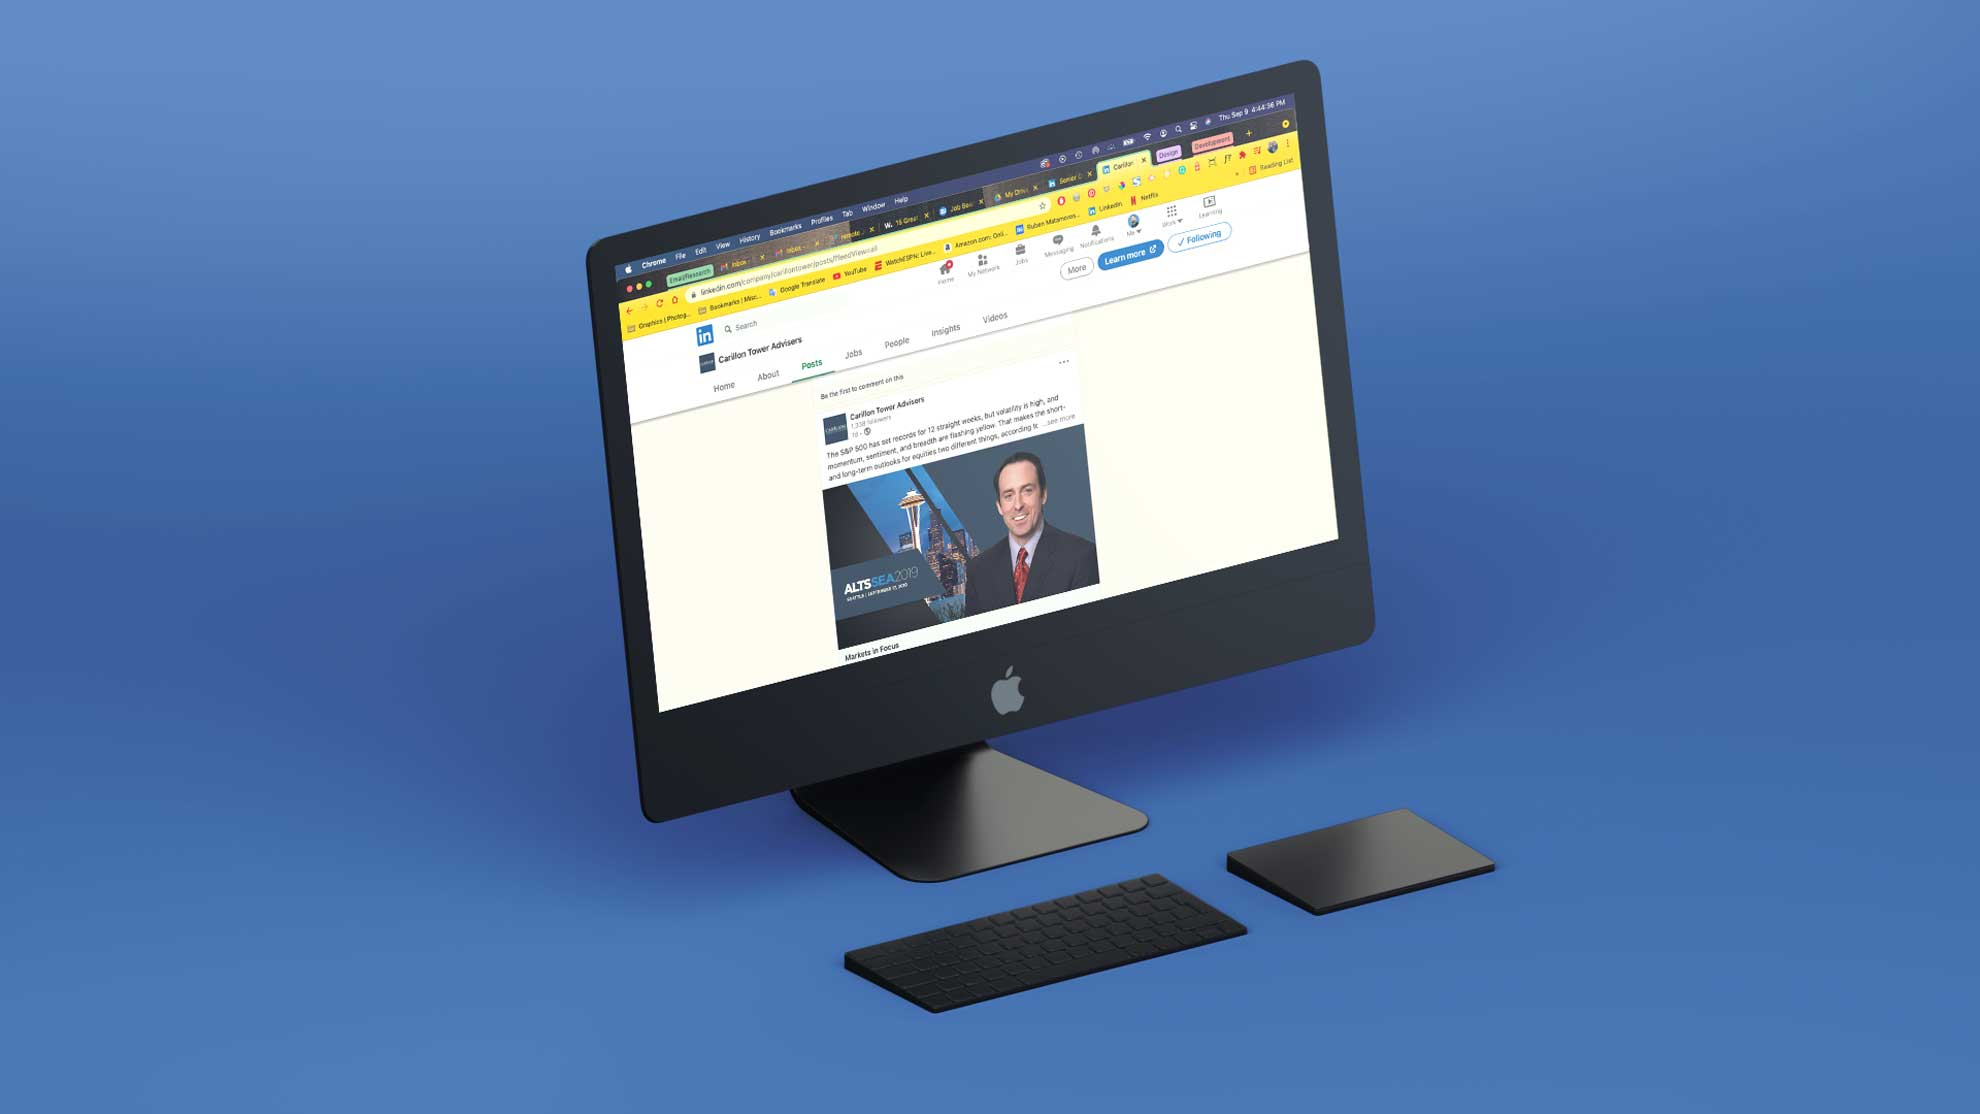 CTA-LinkedIn-Cooper-AltSea2019-iMac-Mockup